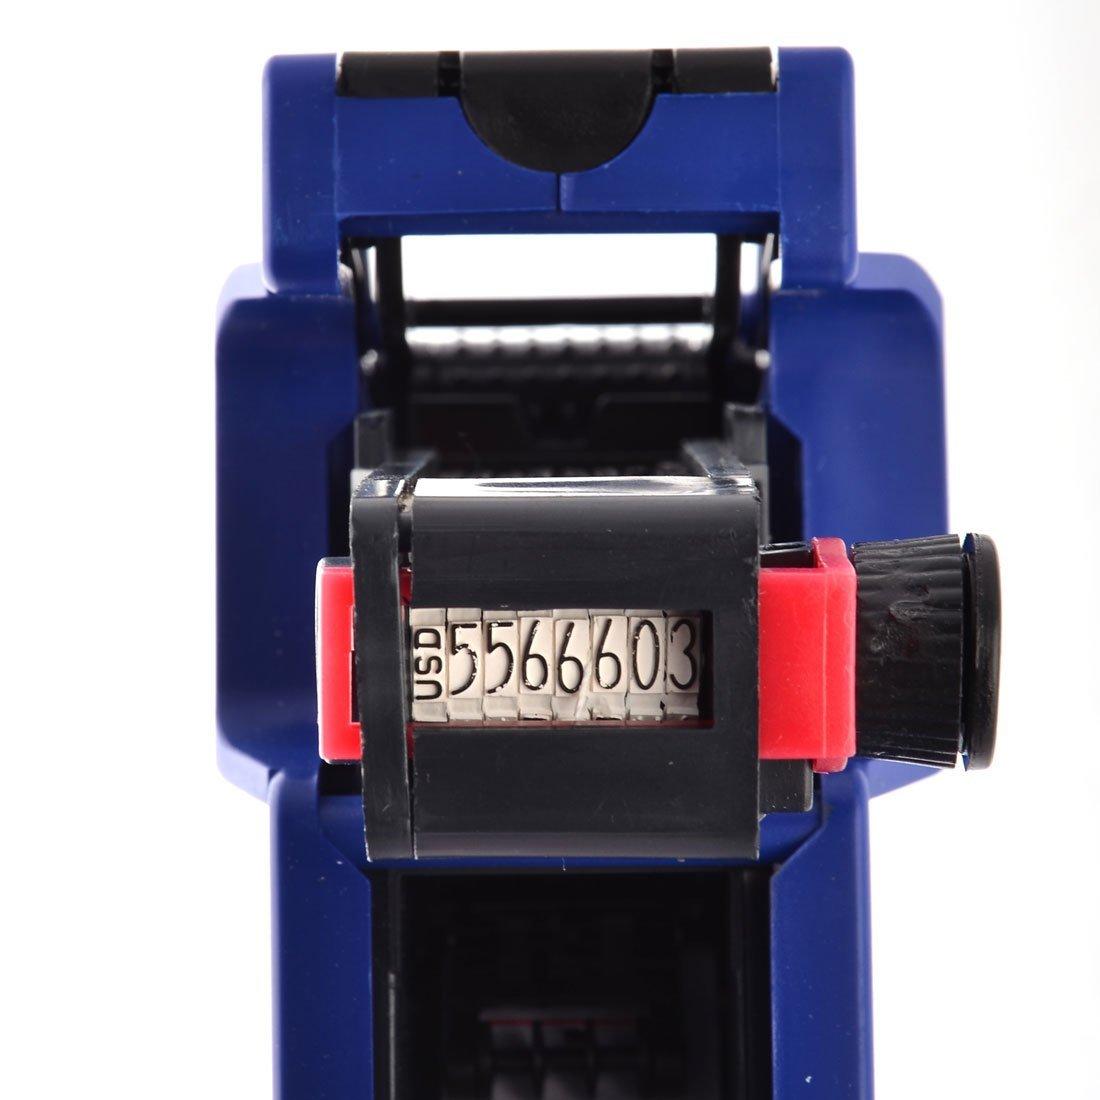 DealMux Ceia Mercado Loja Loja 8 dígitos Preço Labeller rolo Etiqueta de tinta azul